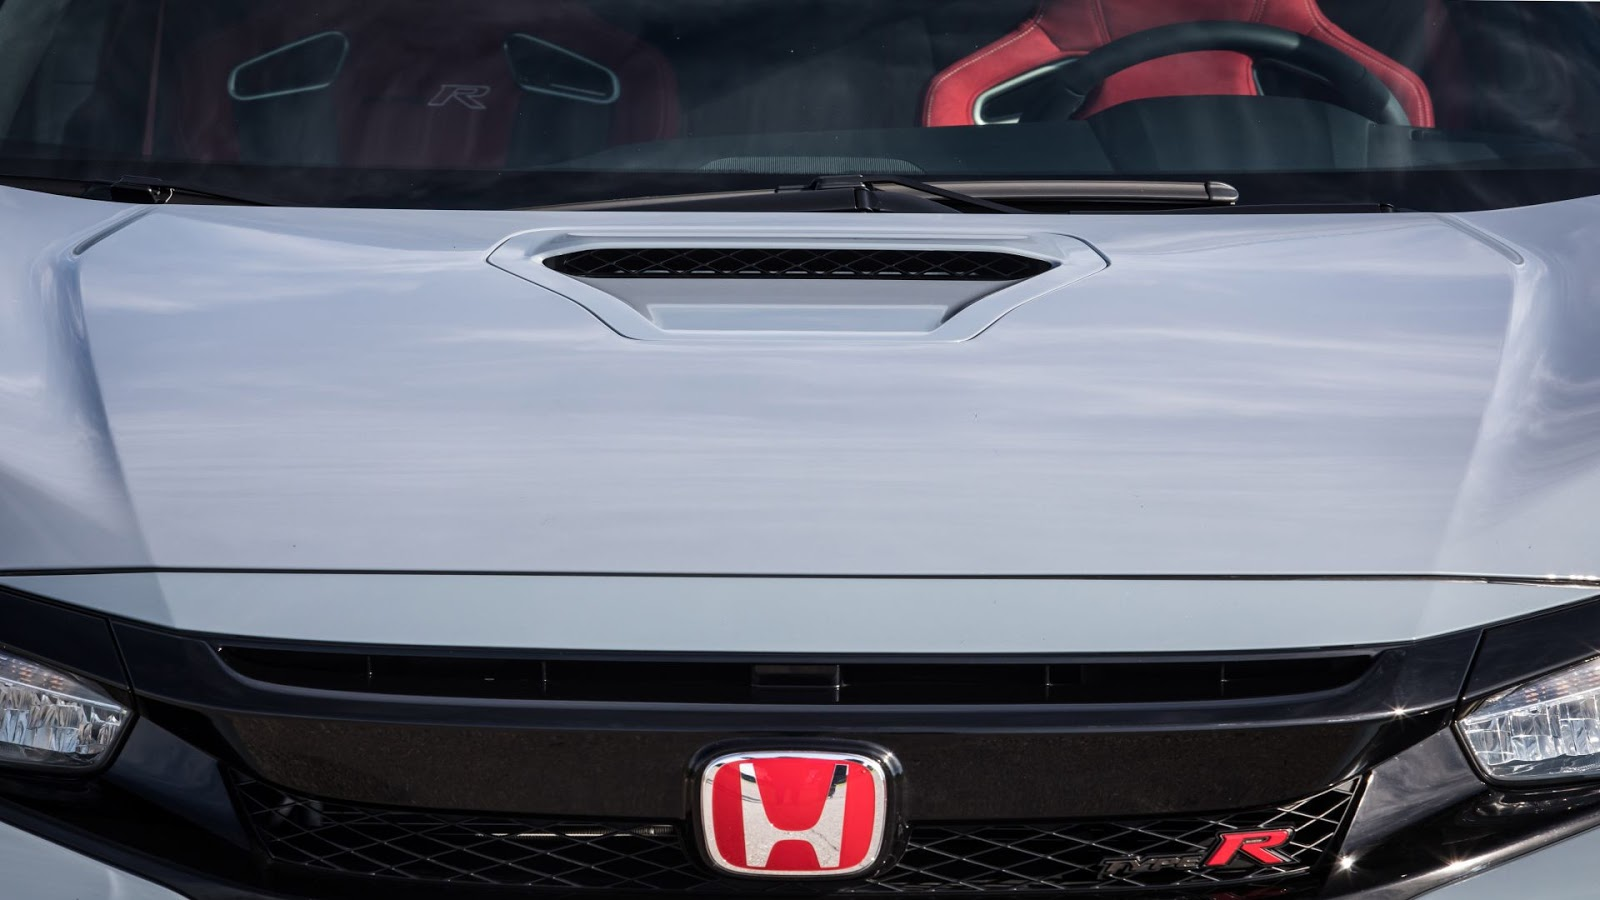 Civic2BType2BR Low25281012529 2 Τα 16 καλύτερα hot hatches Hot Hatch, Virtual Garage, ΦΩΤΟ, φωτογραφίες